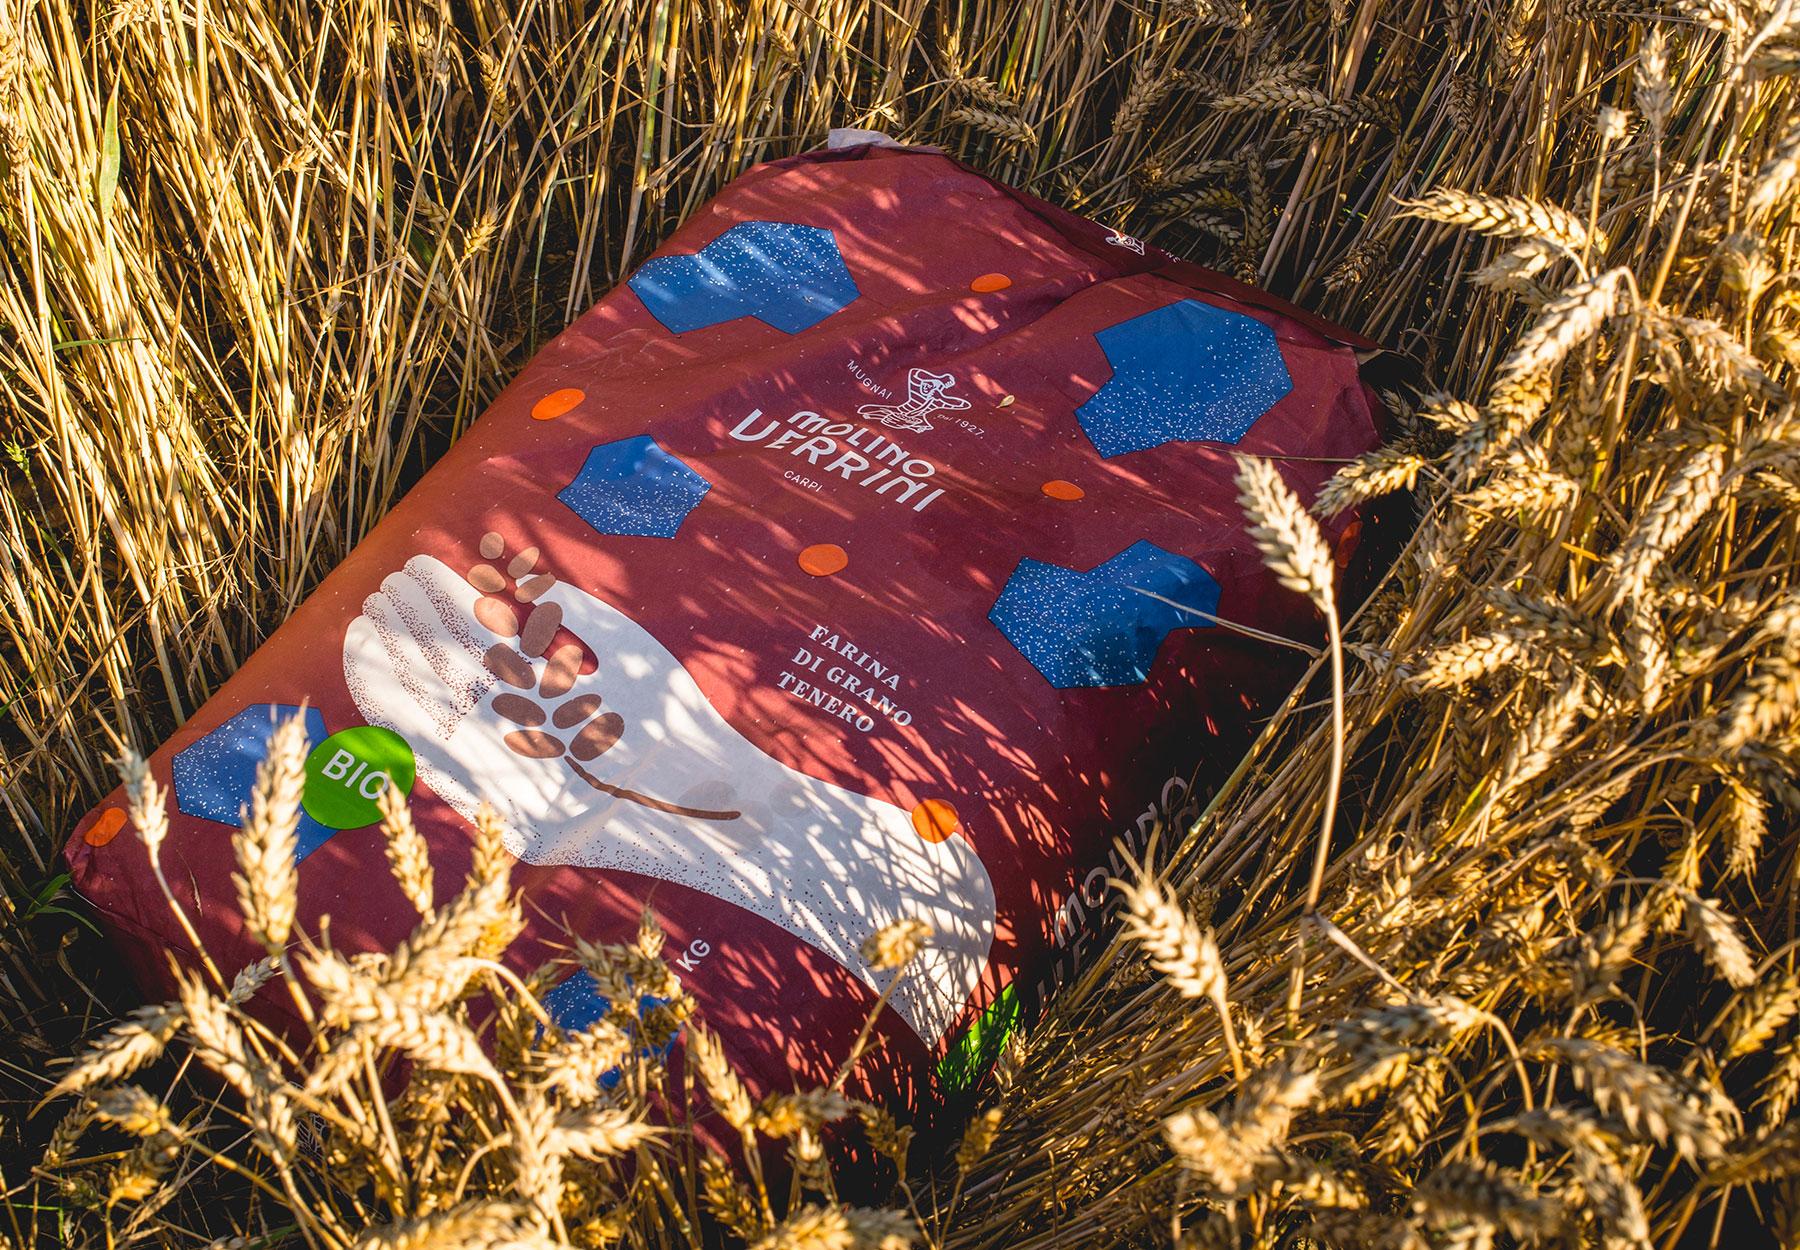 Flour packaging design-DryStudio